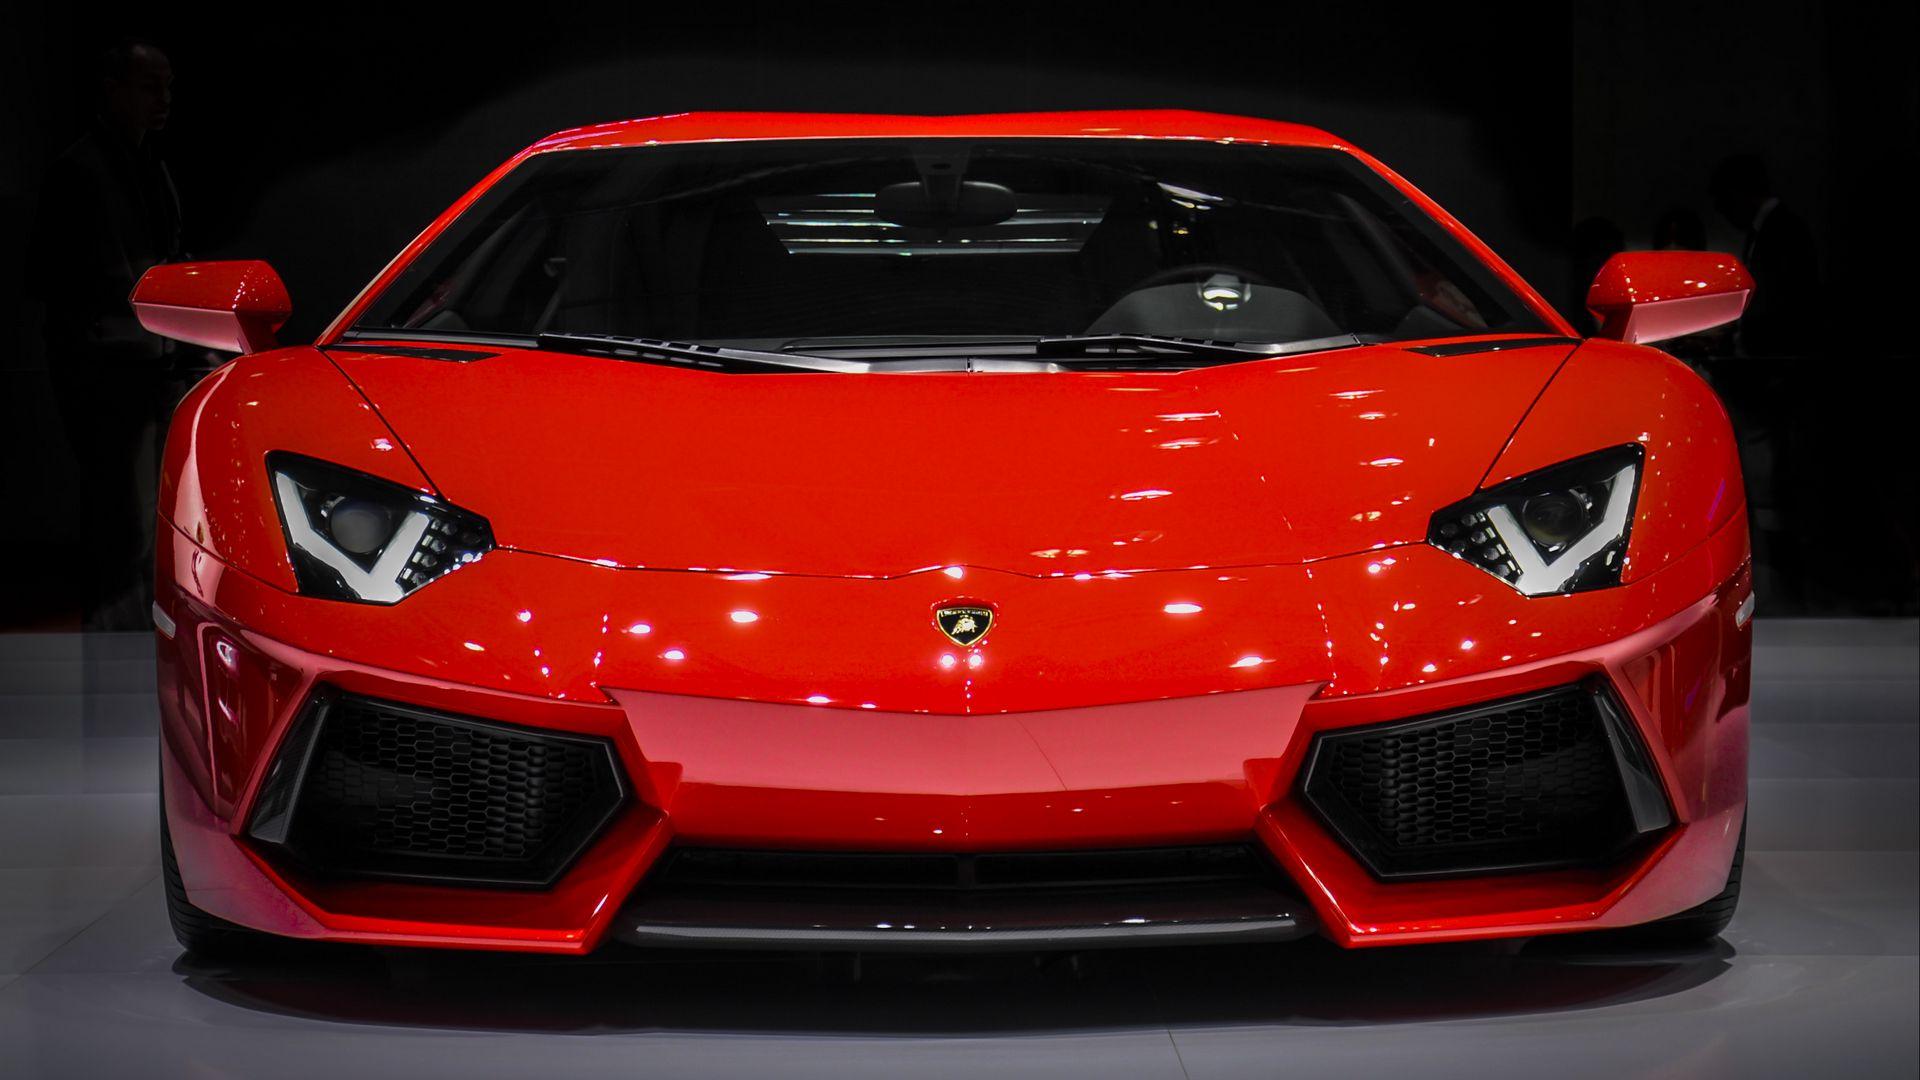 The Best Wallpapers Related to Lamborghini Aventador, Lamborghini, Sportscar (4)